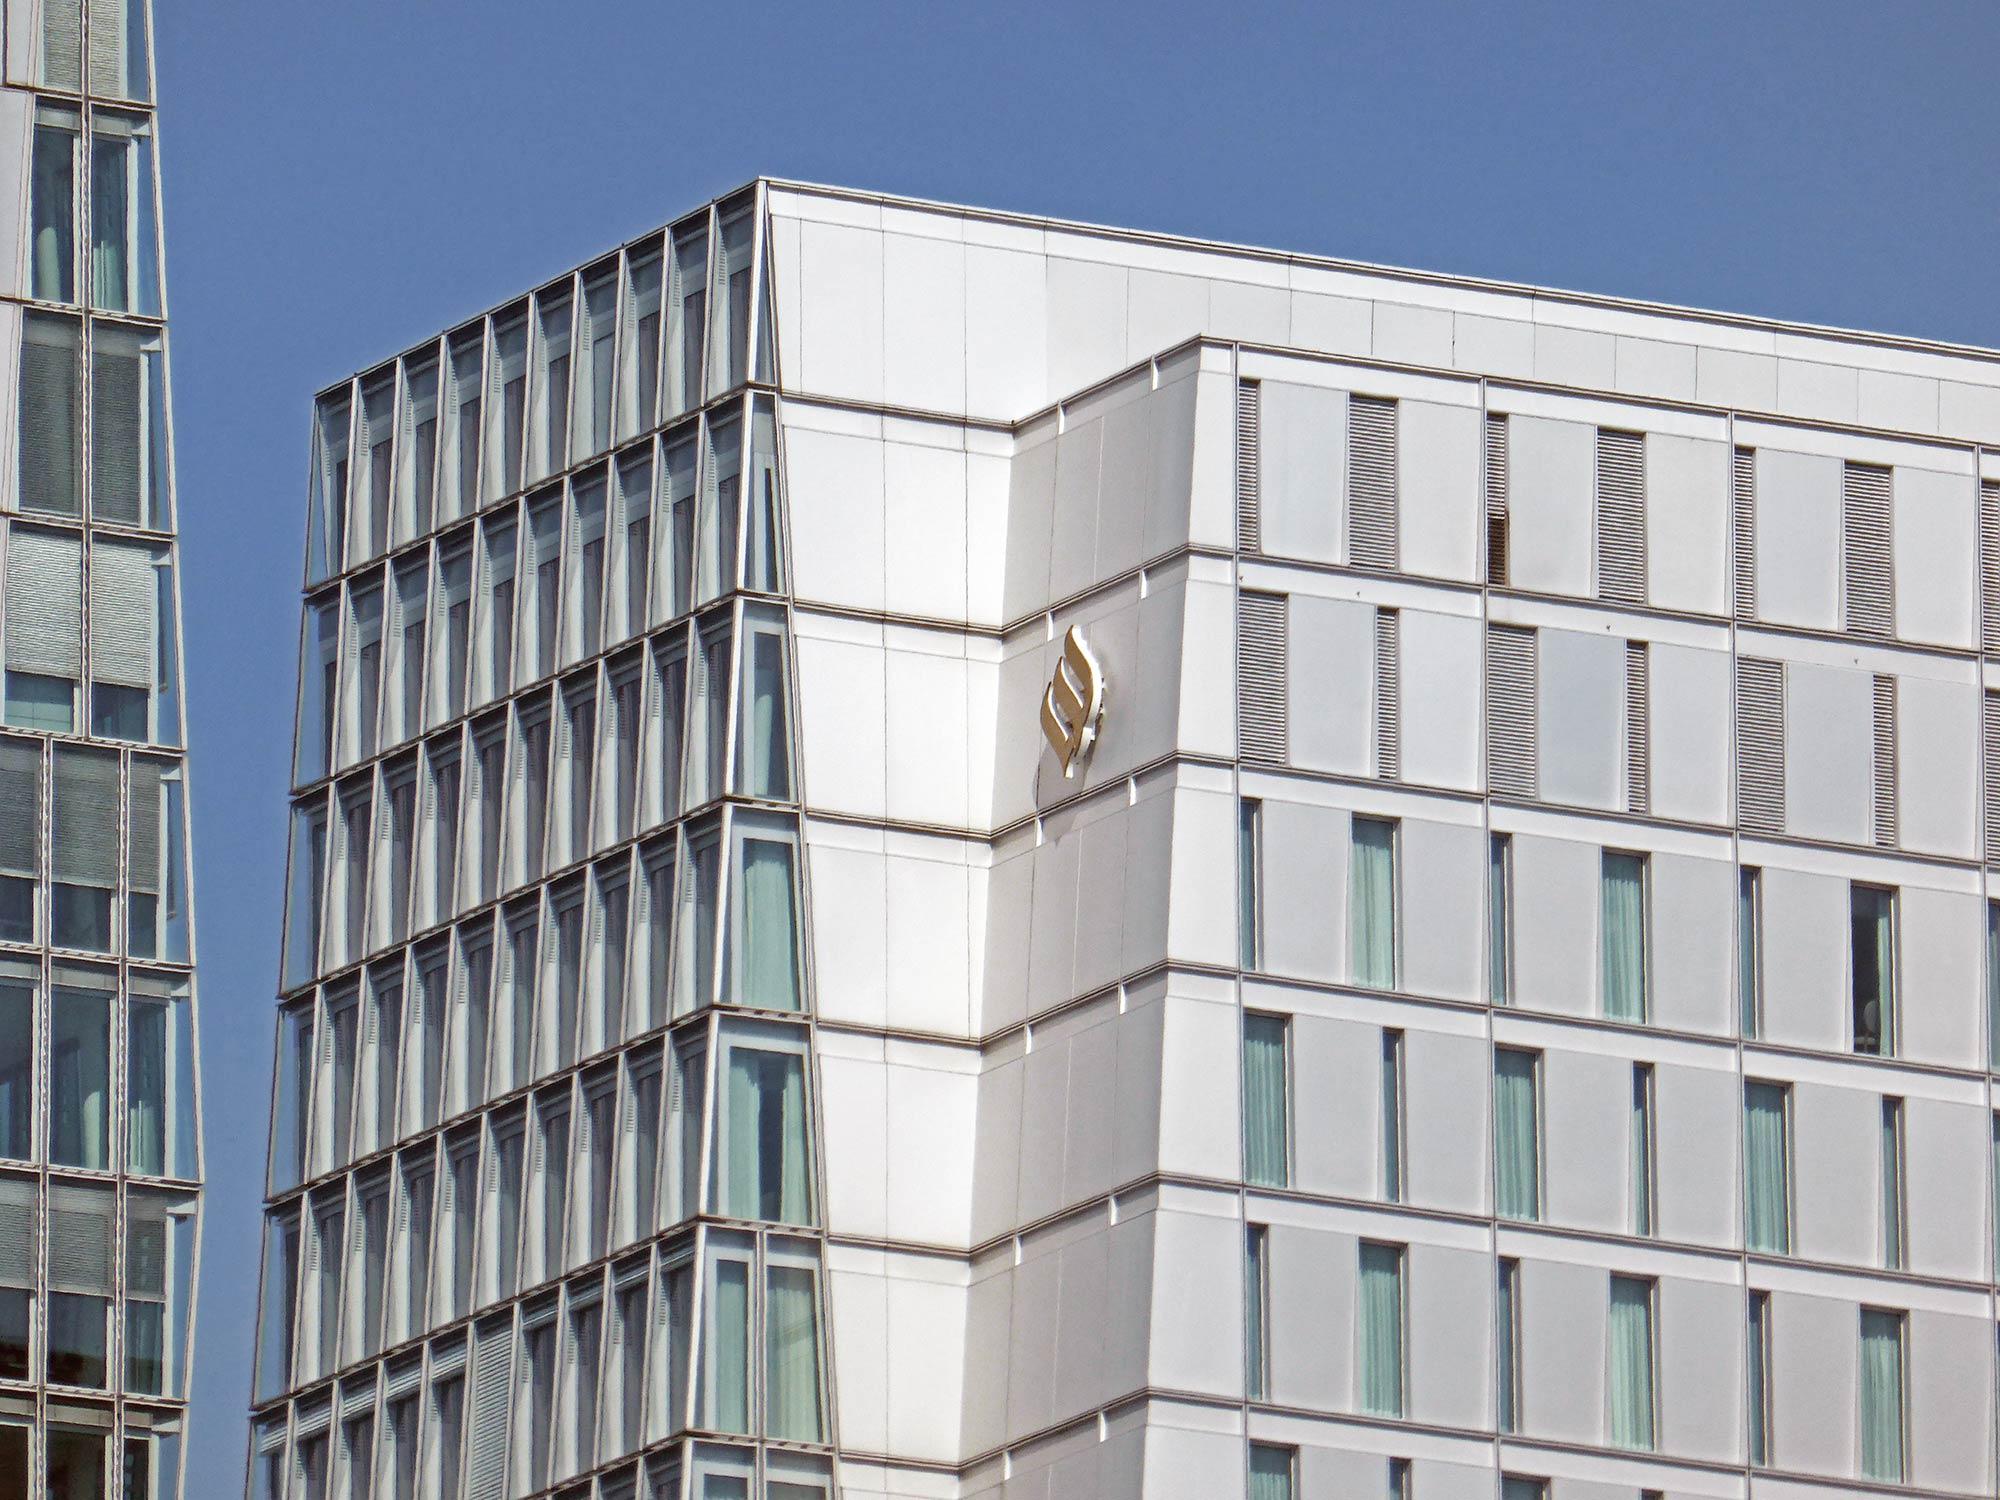 Skyline Hotel Frankfurt - Jumeirah Group Dubai - KSP Engel und Zimmermann - Palais Quartier Hotel am Myzeil Hauptwache